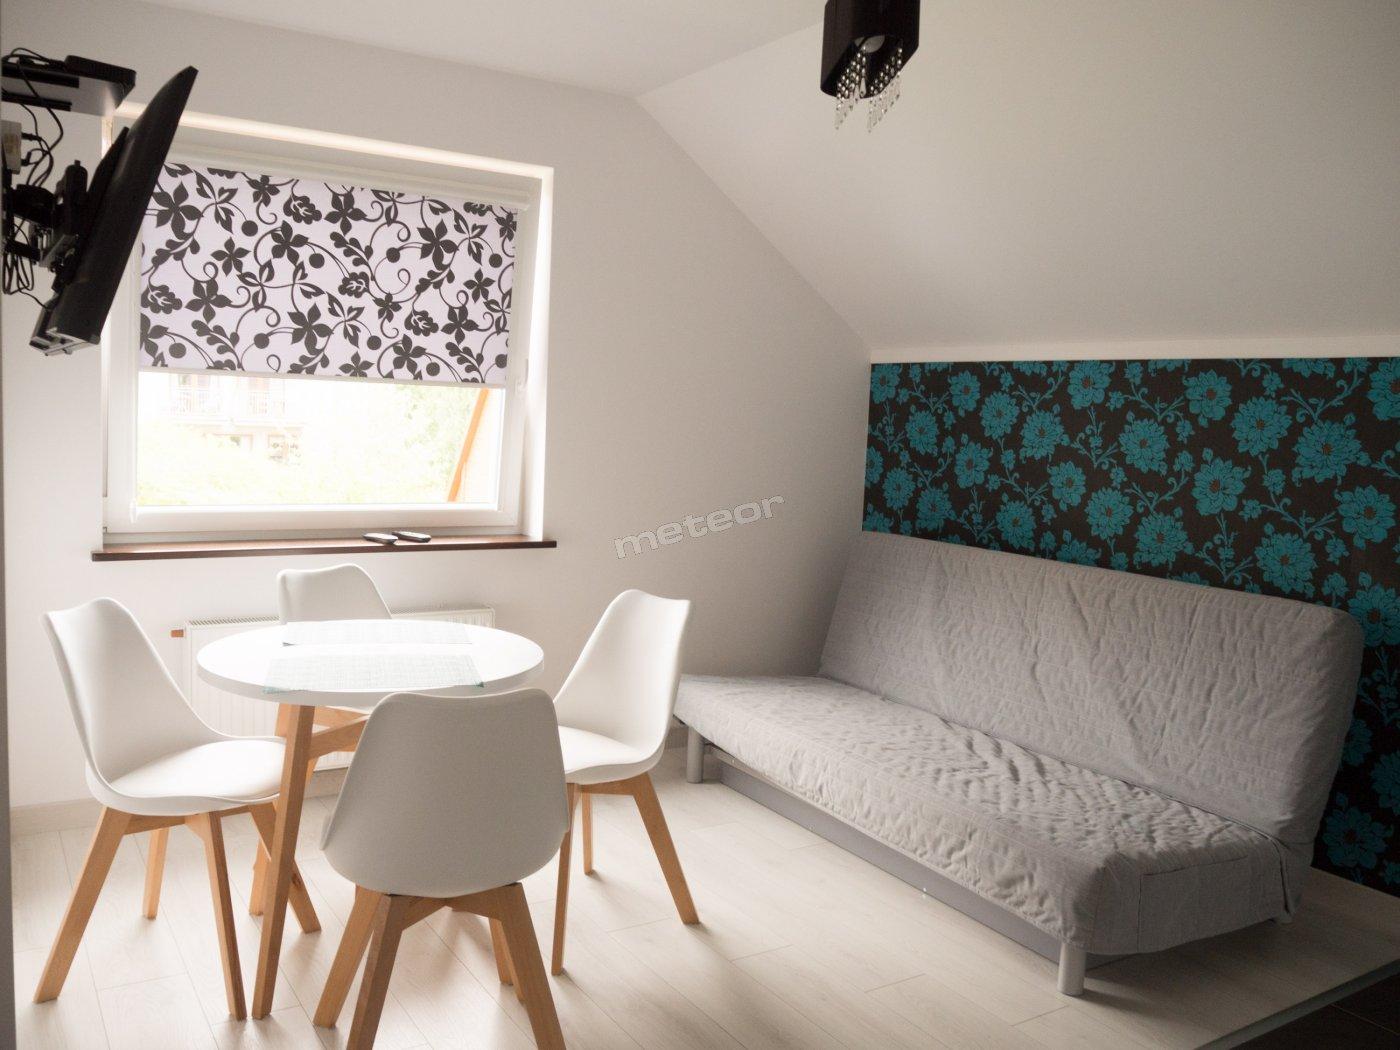 Apartament skandynawski-4 osobowy